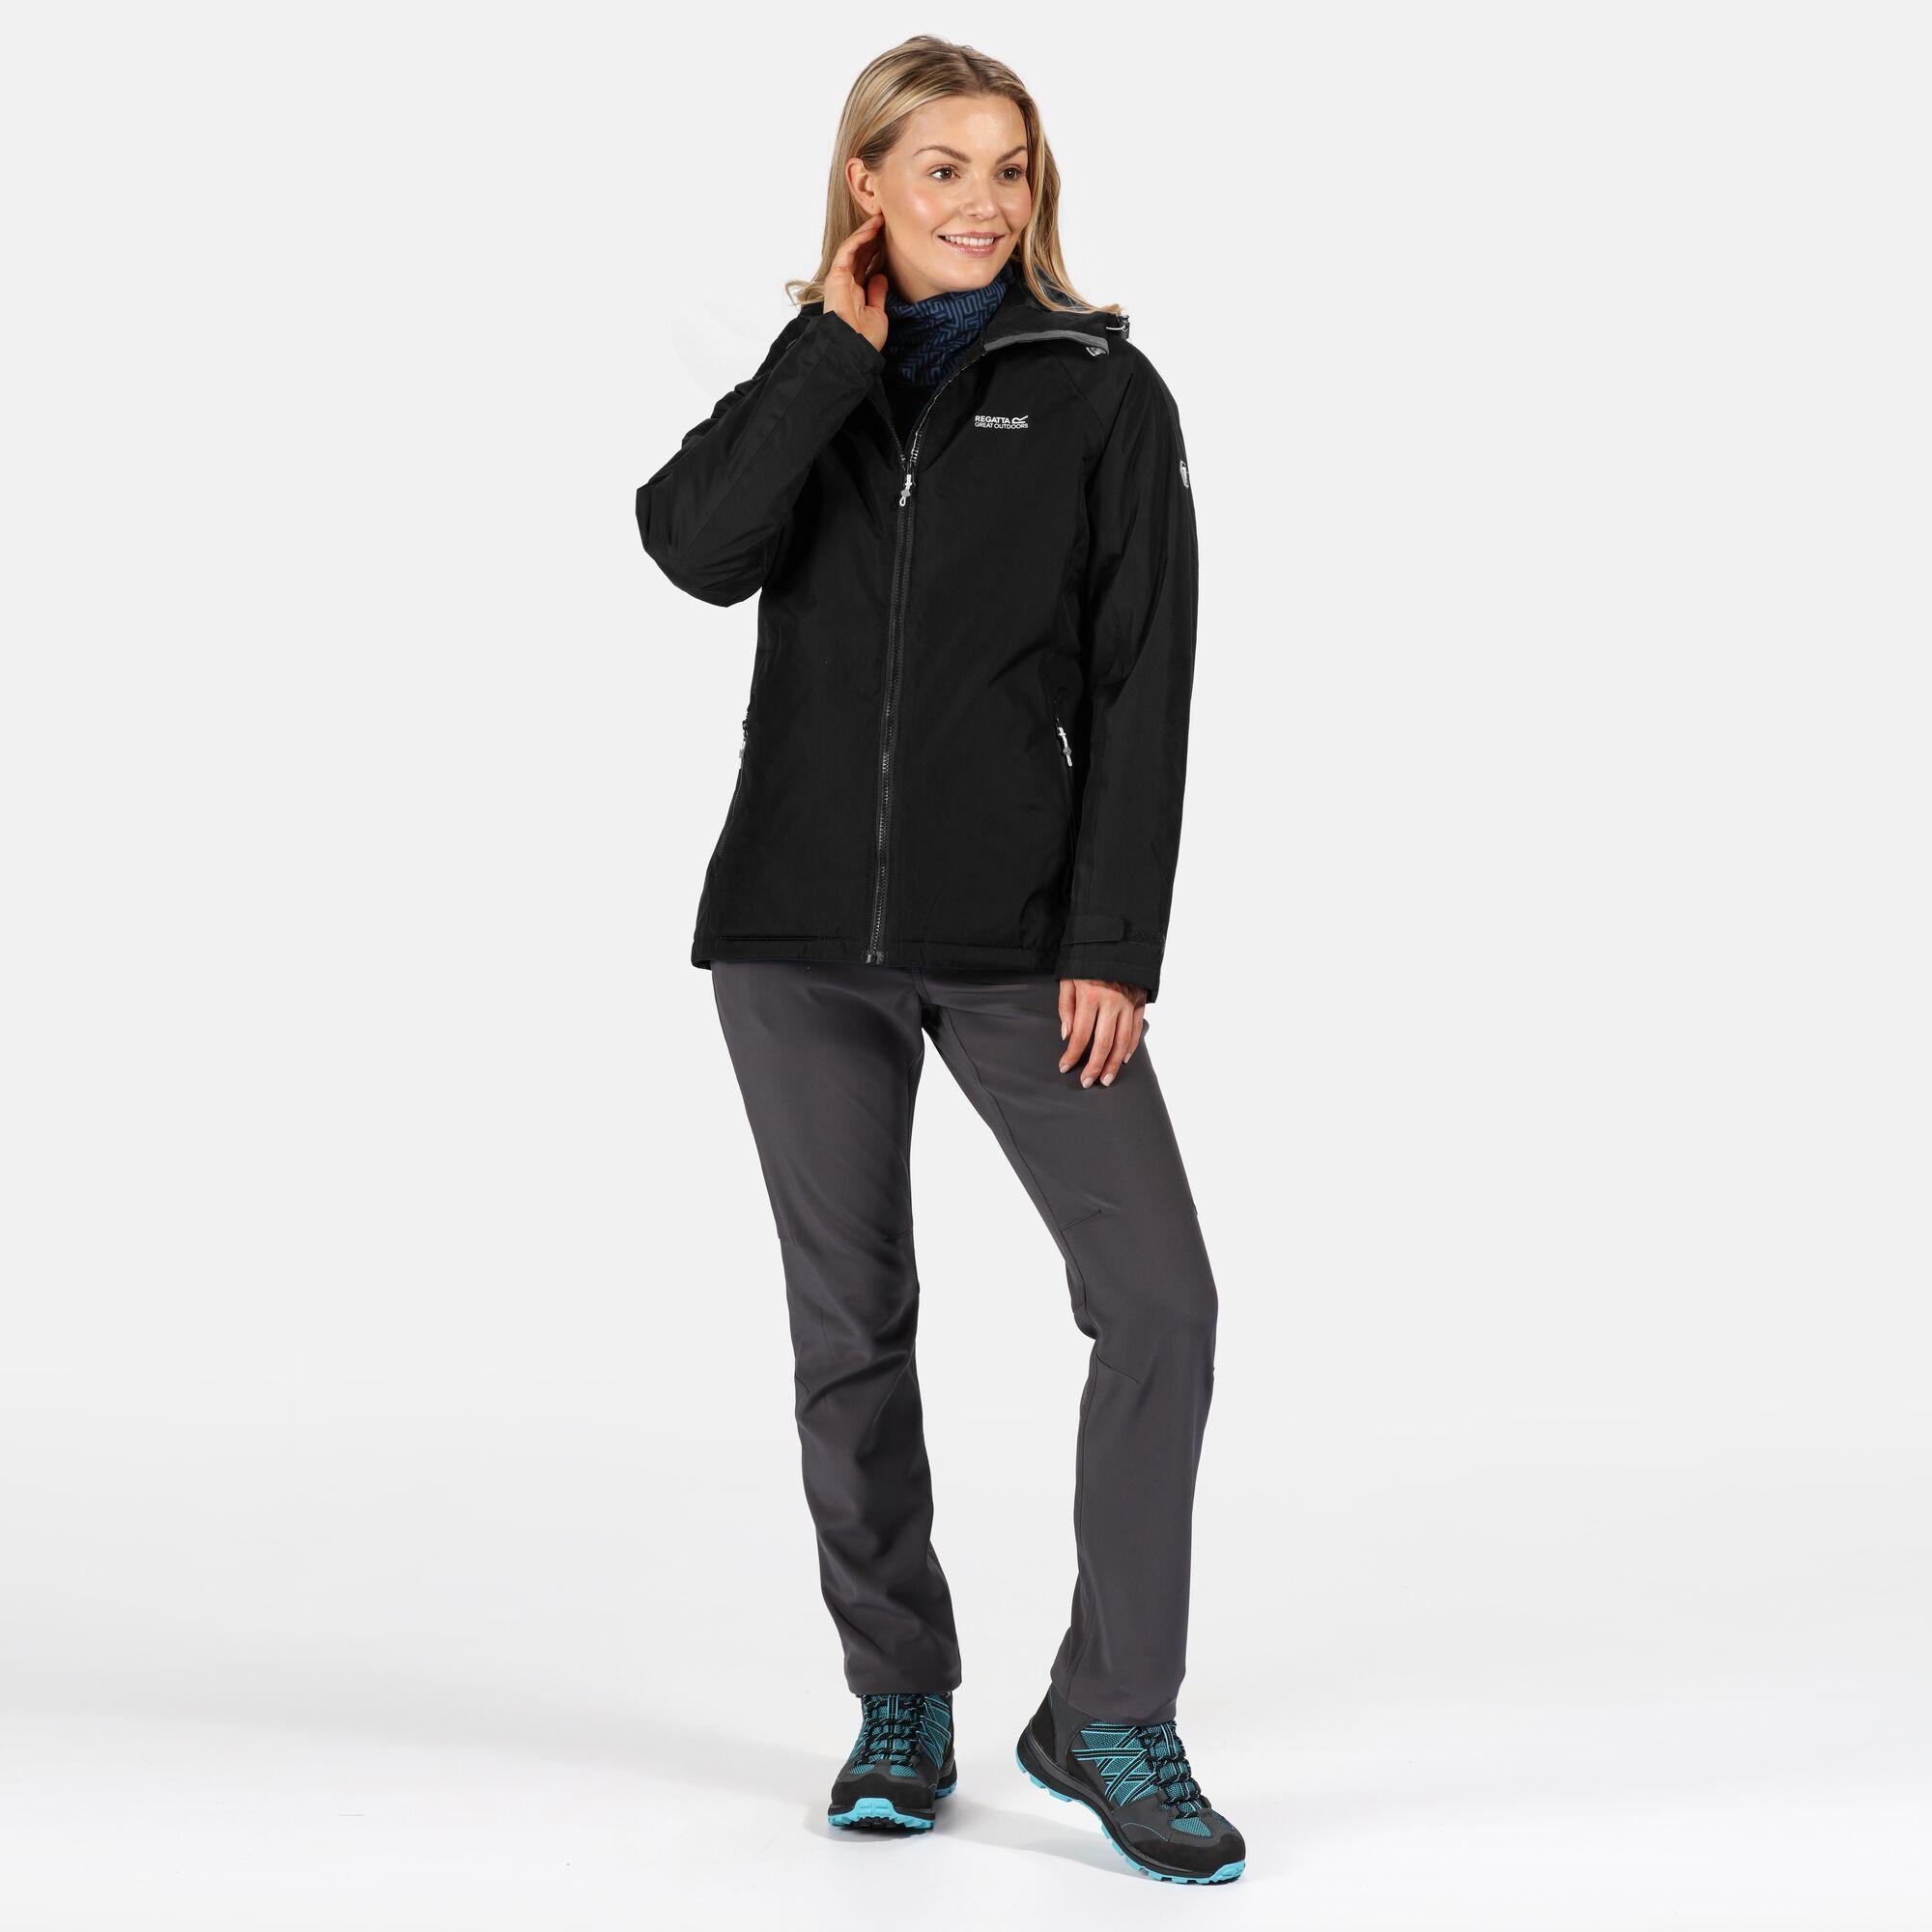 Regatta Womens/Ladies Voltera Protect Insulated Waterproof Jacket (Black)